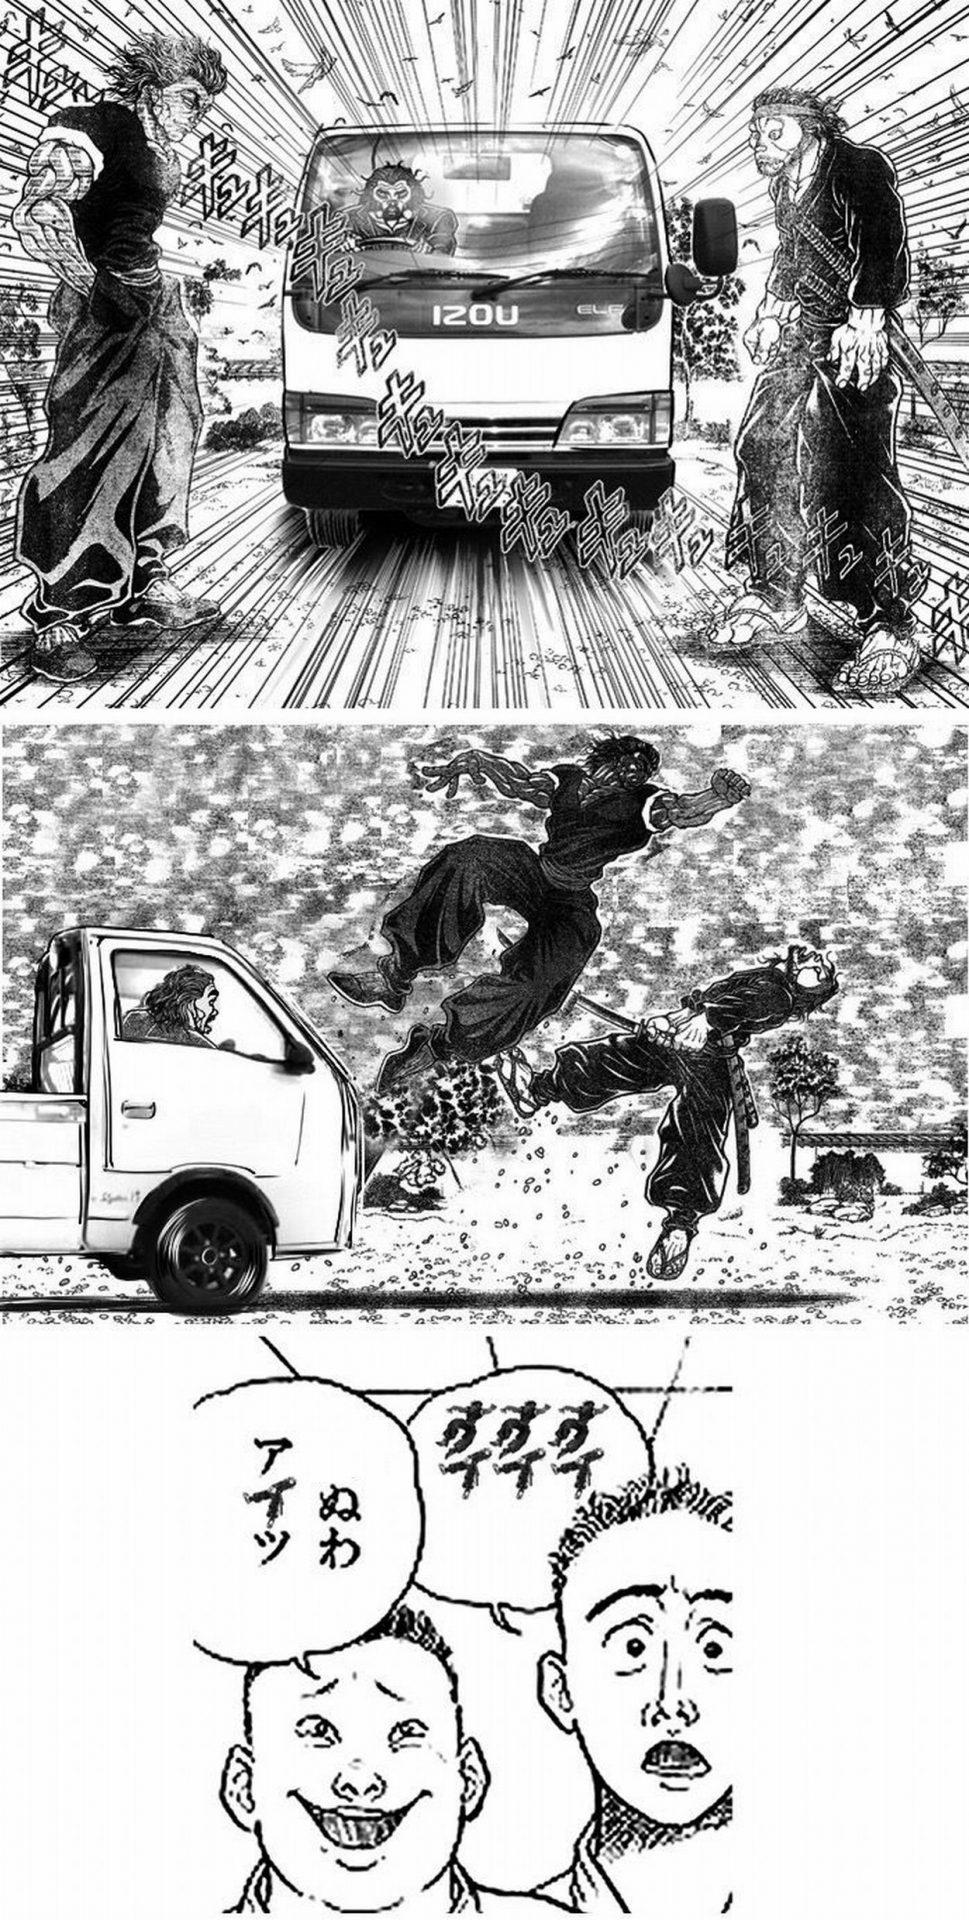 ff069d64 - 【腹筋崩壊】刃牙シリーズの面白いコラ画像まとめてみた!!